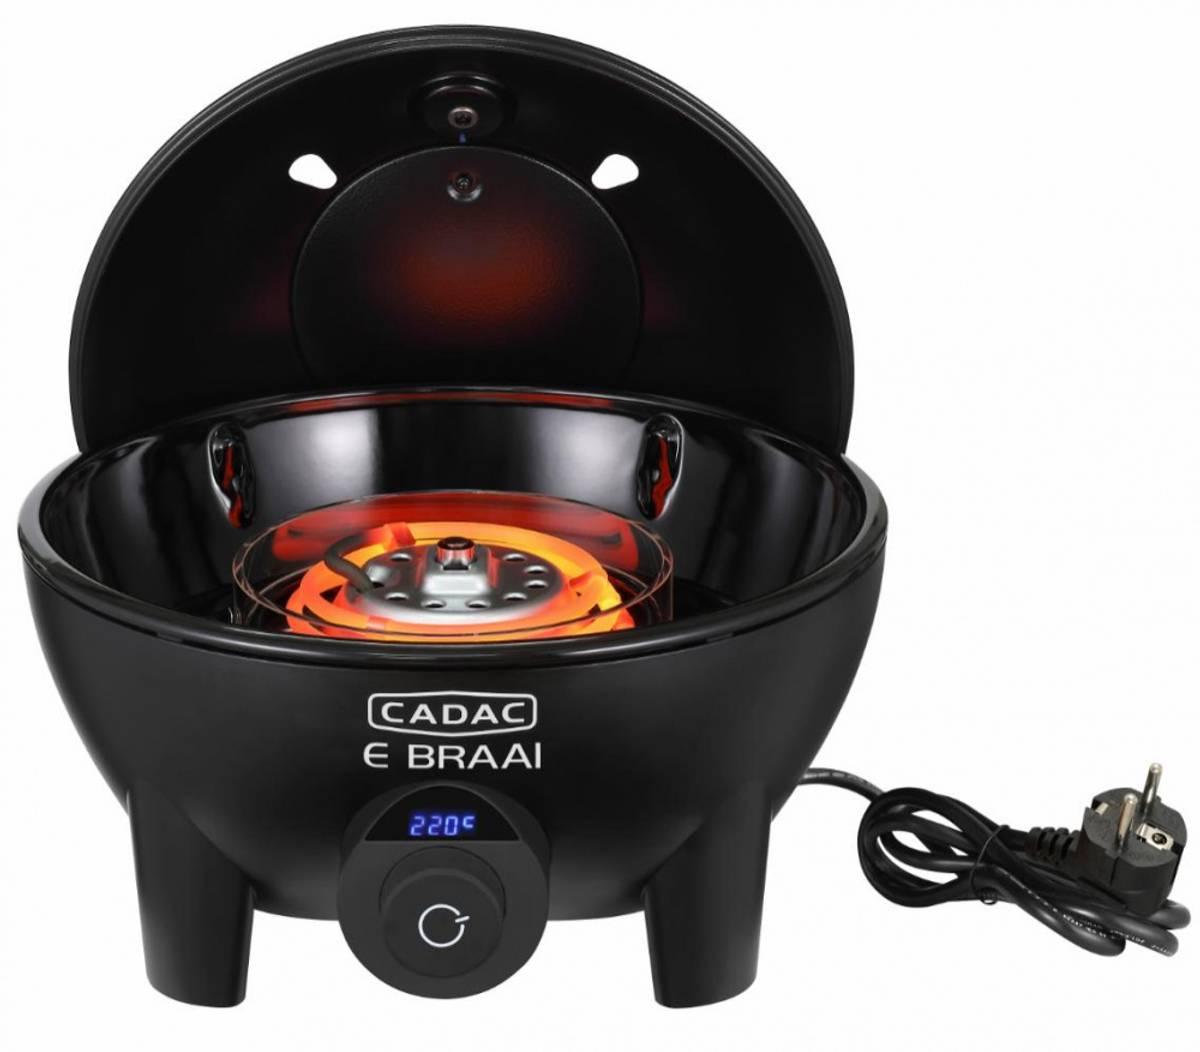 Cadac E-BRAAl elektrisk grill Ø40 bordmodell stor varmekapasitet